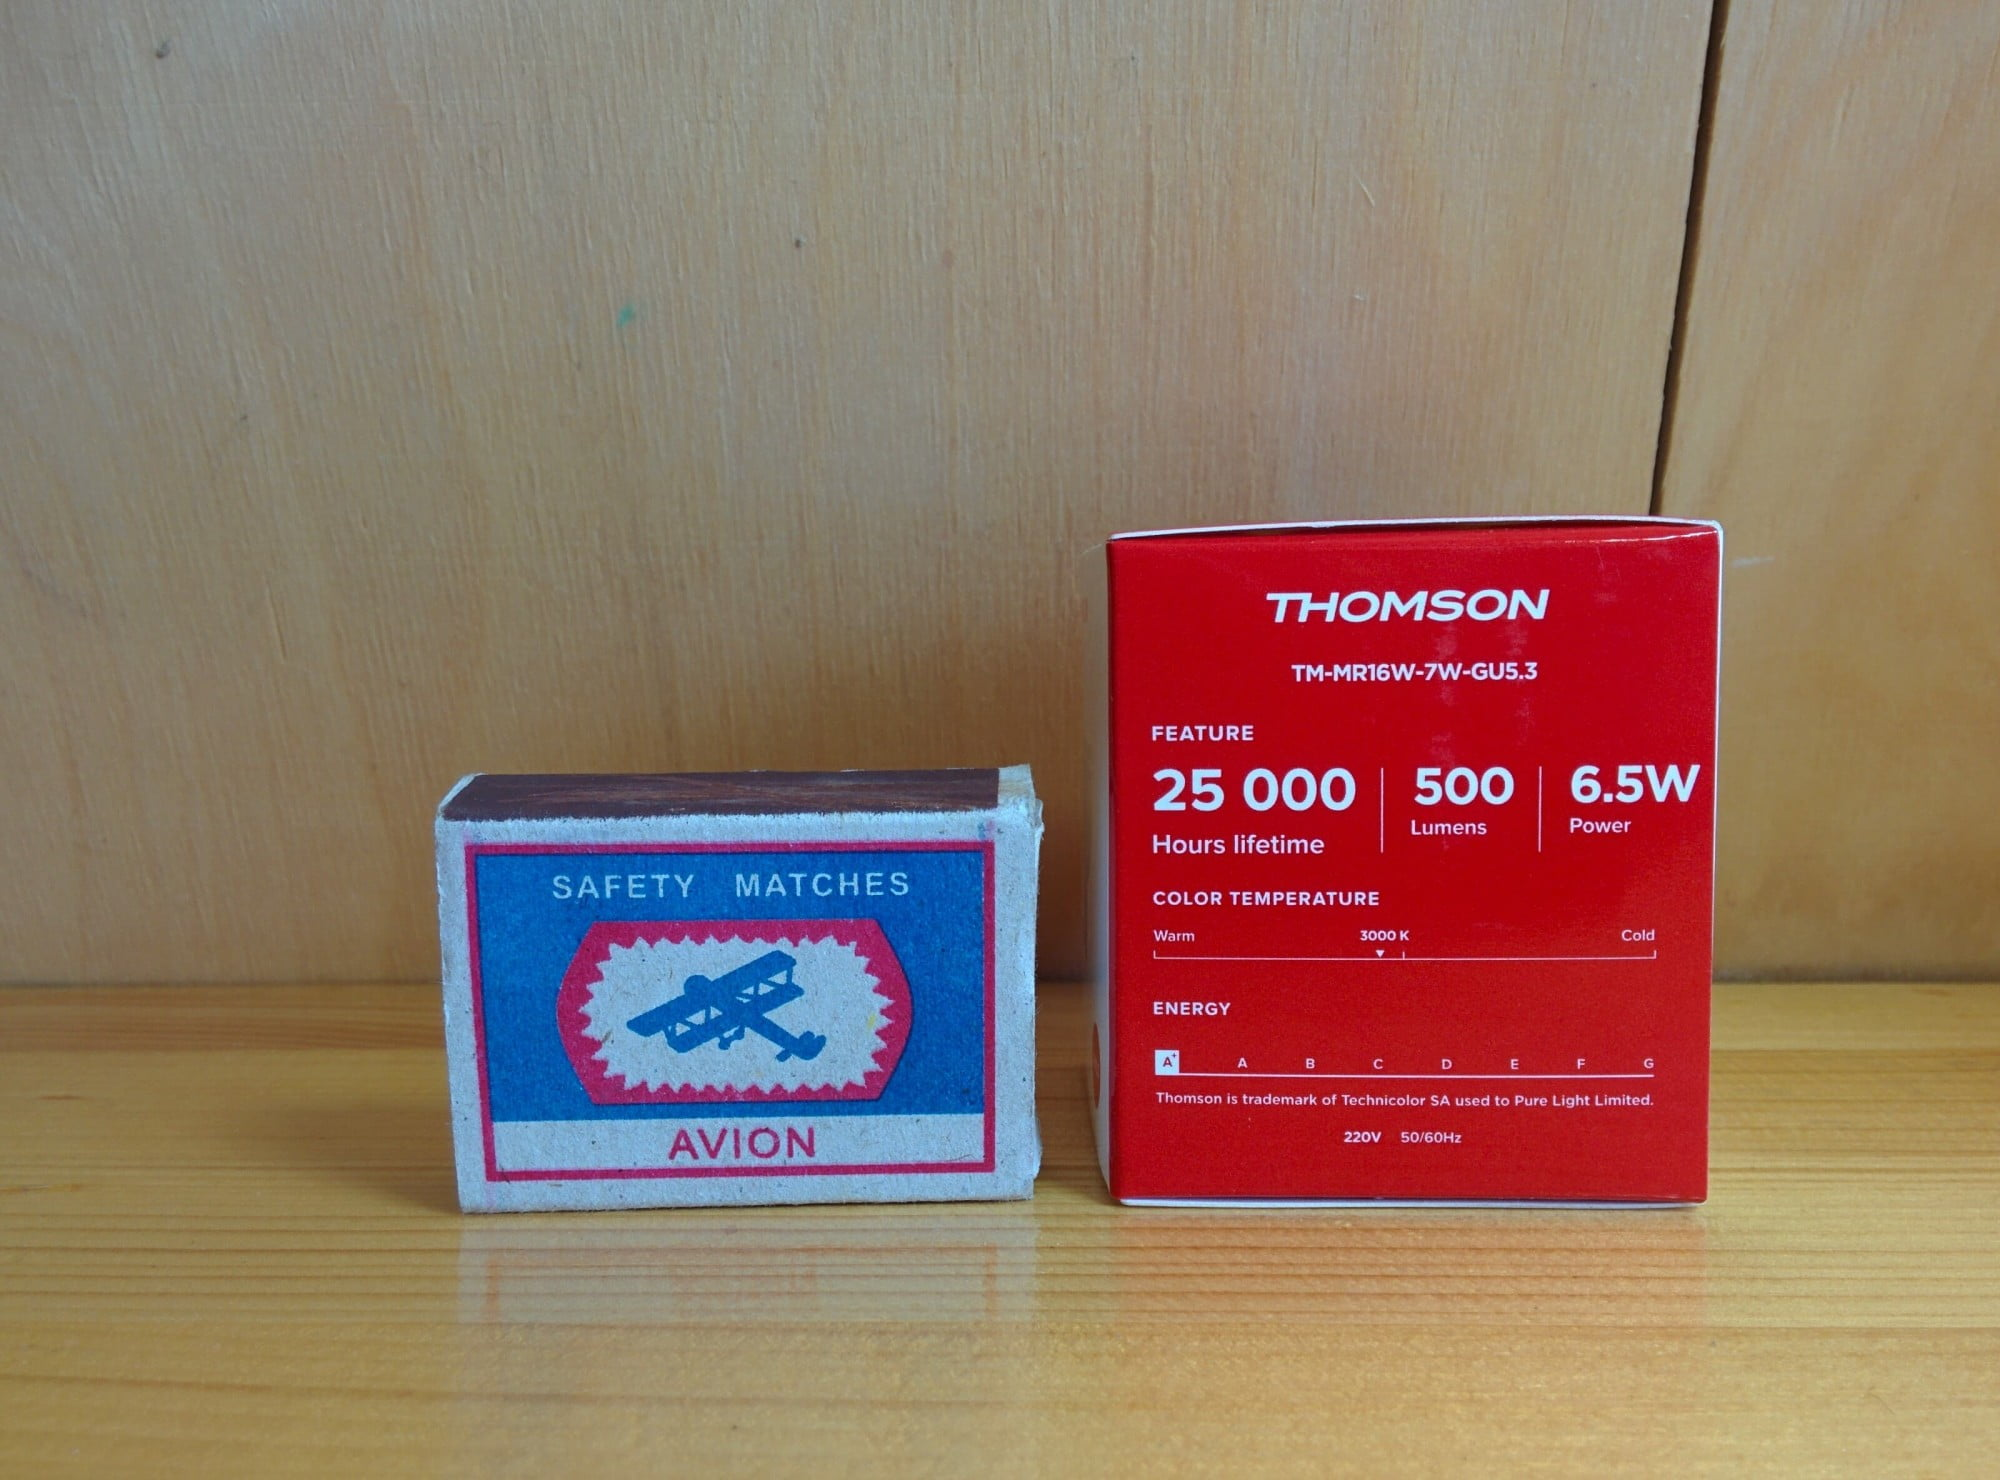 Thomson TM-MR16W-7W-GU5.3 характеристики